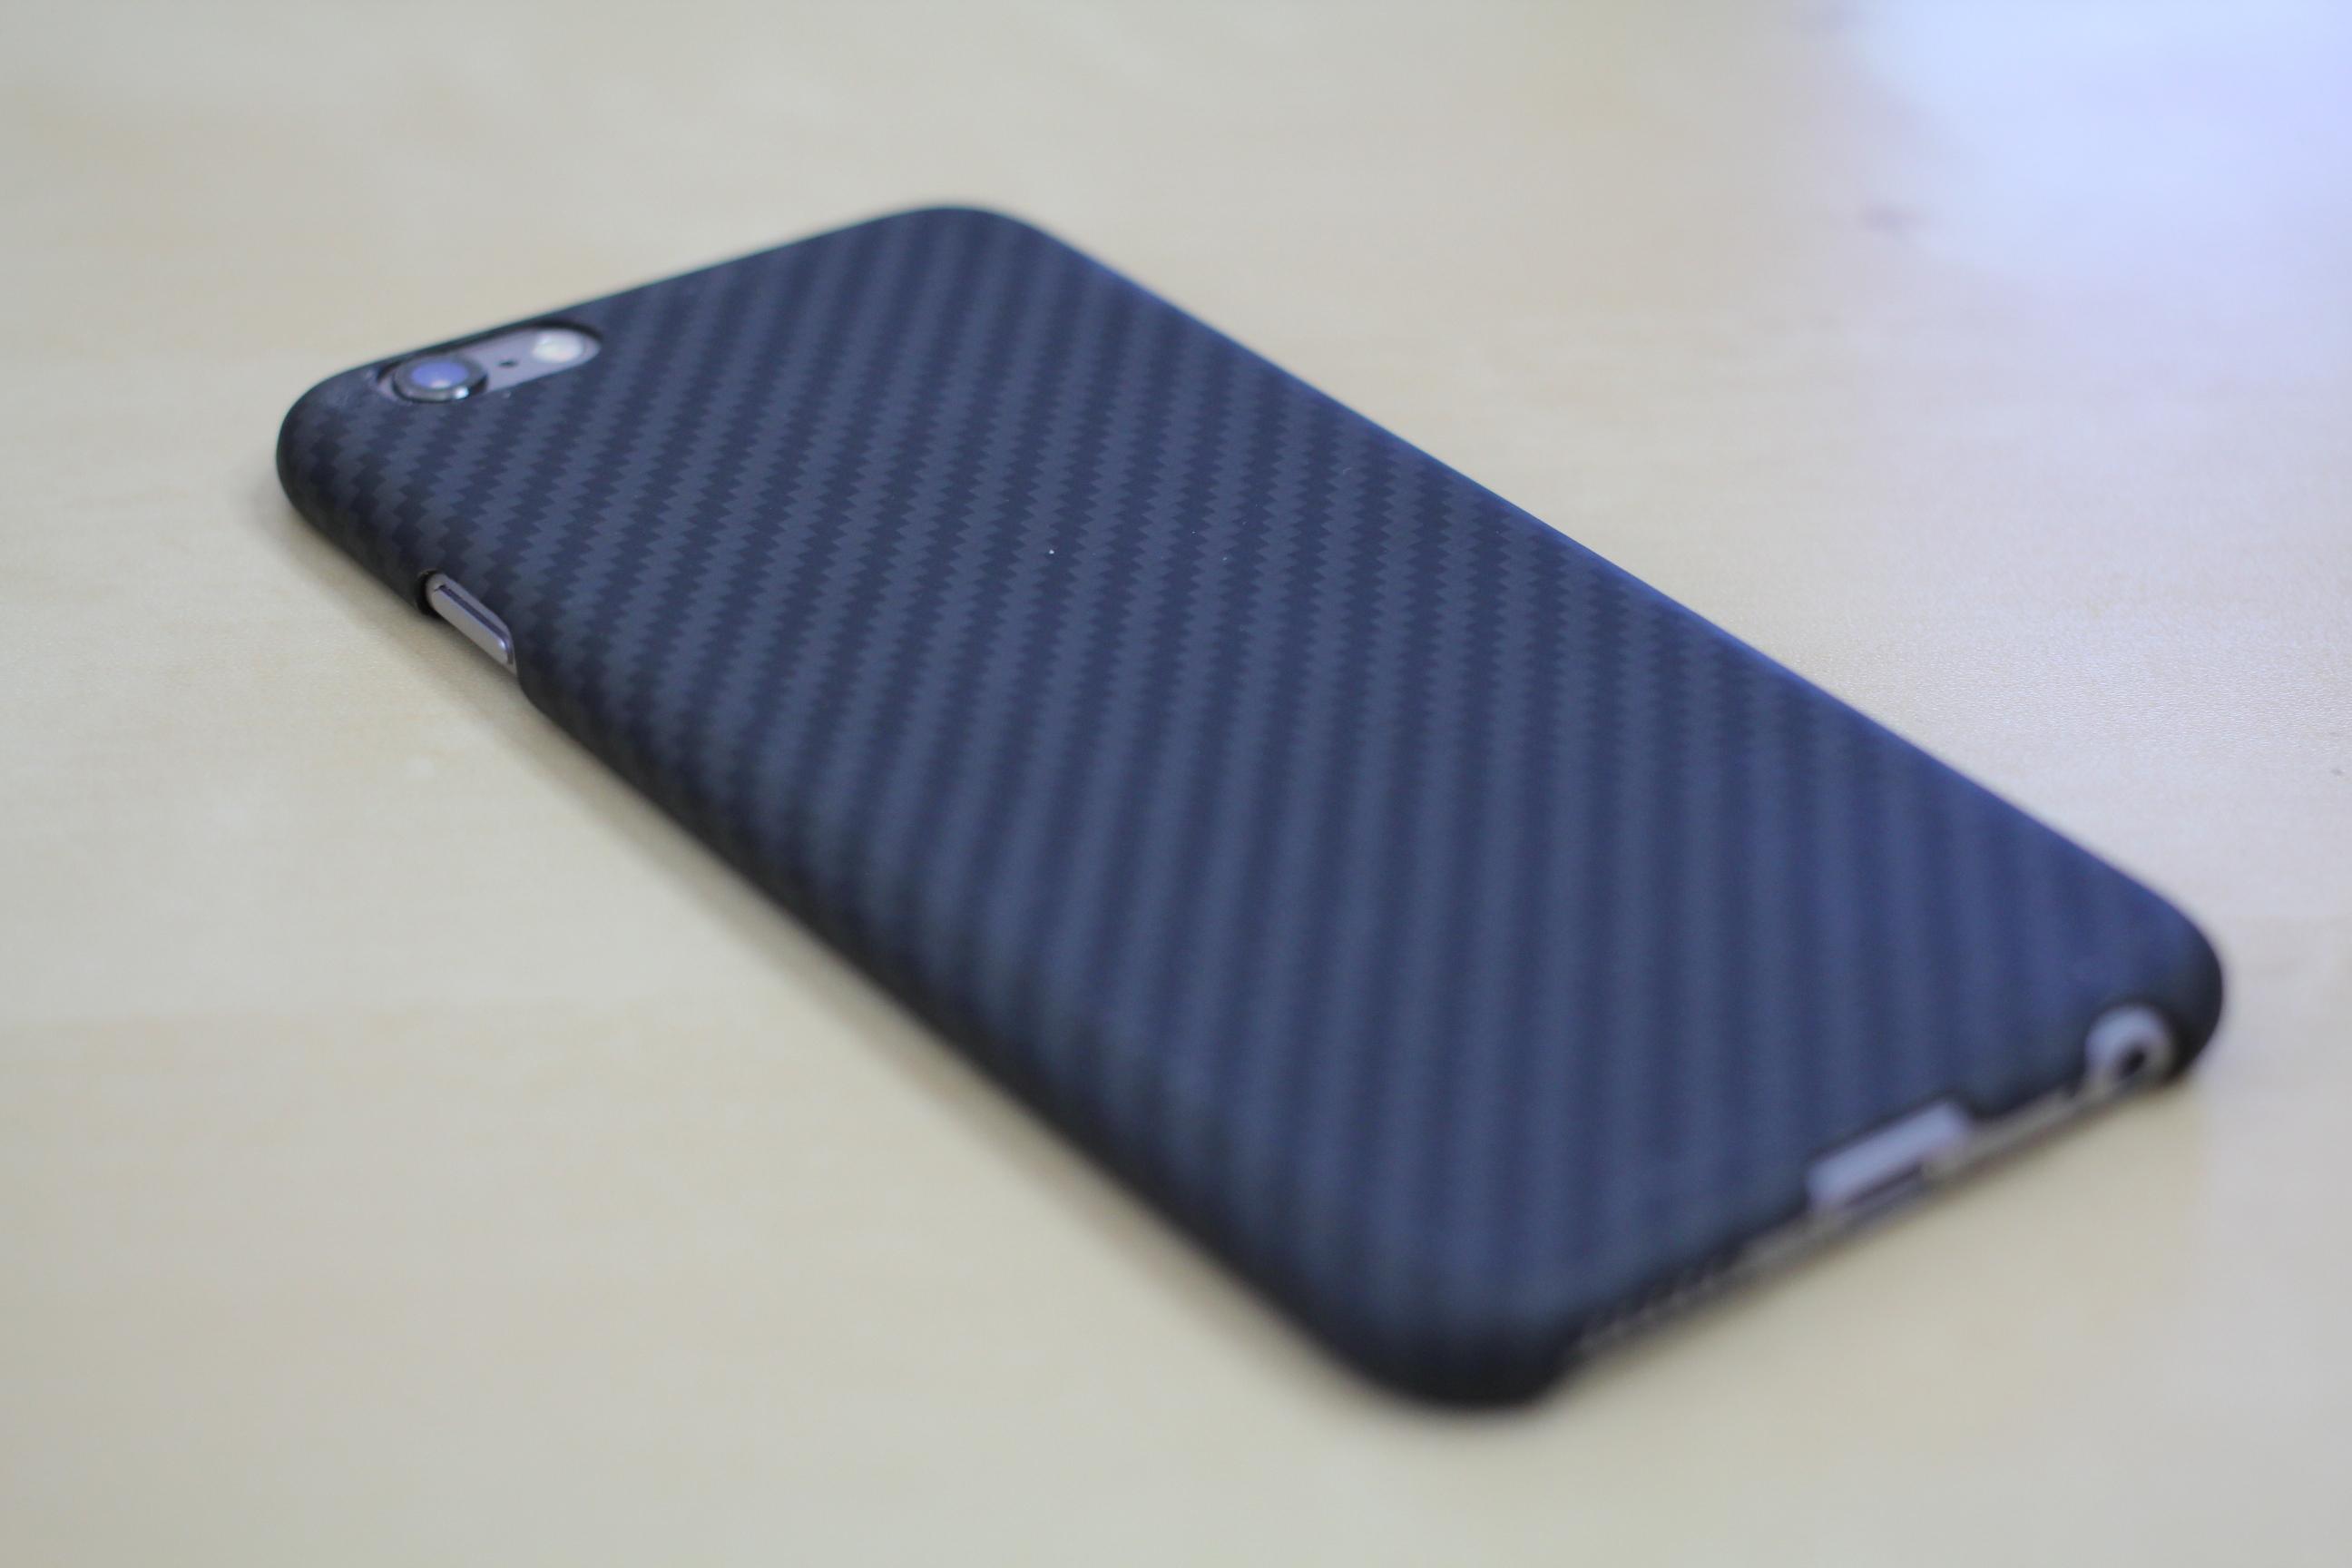 best service b206e 82a3d Pitaka Aramid iPhone Case Review - My New Favorite iPhone Case!